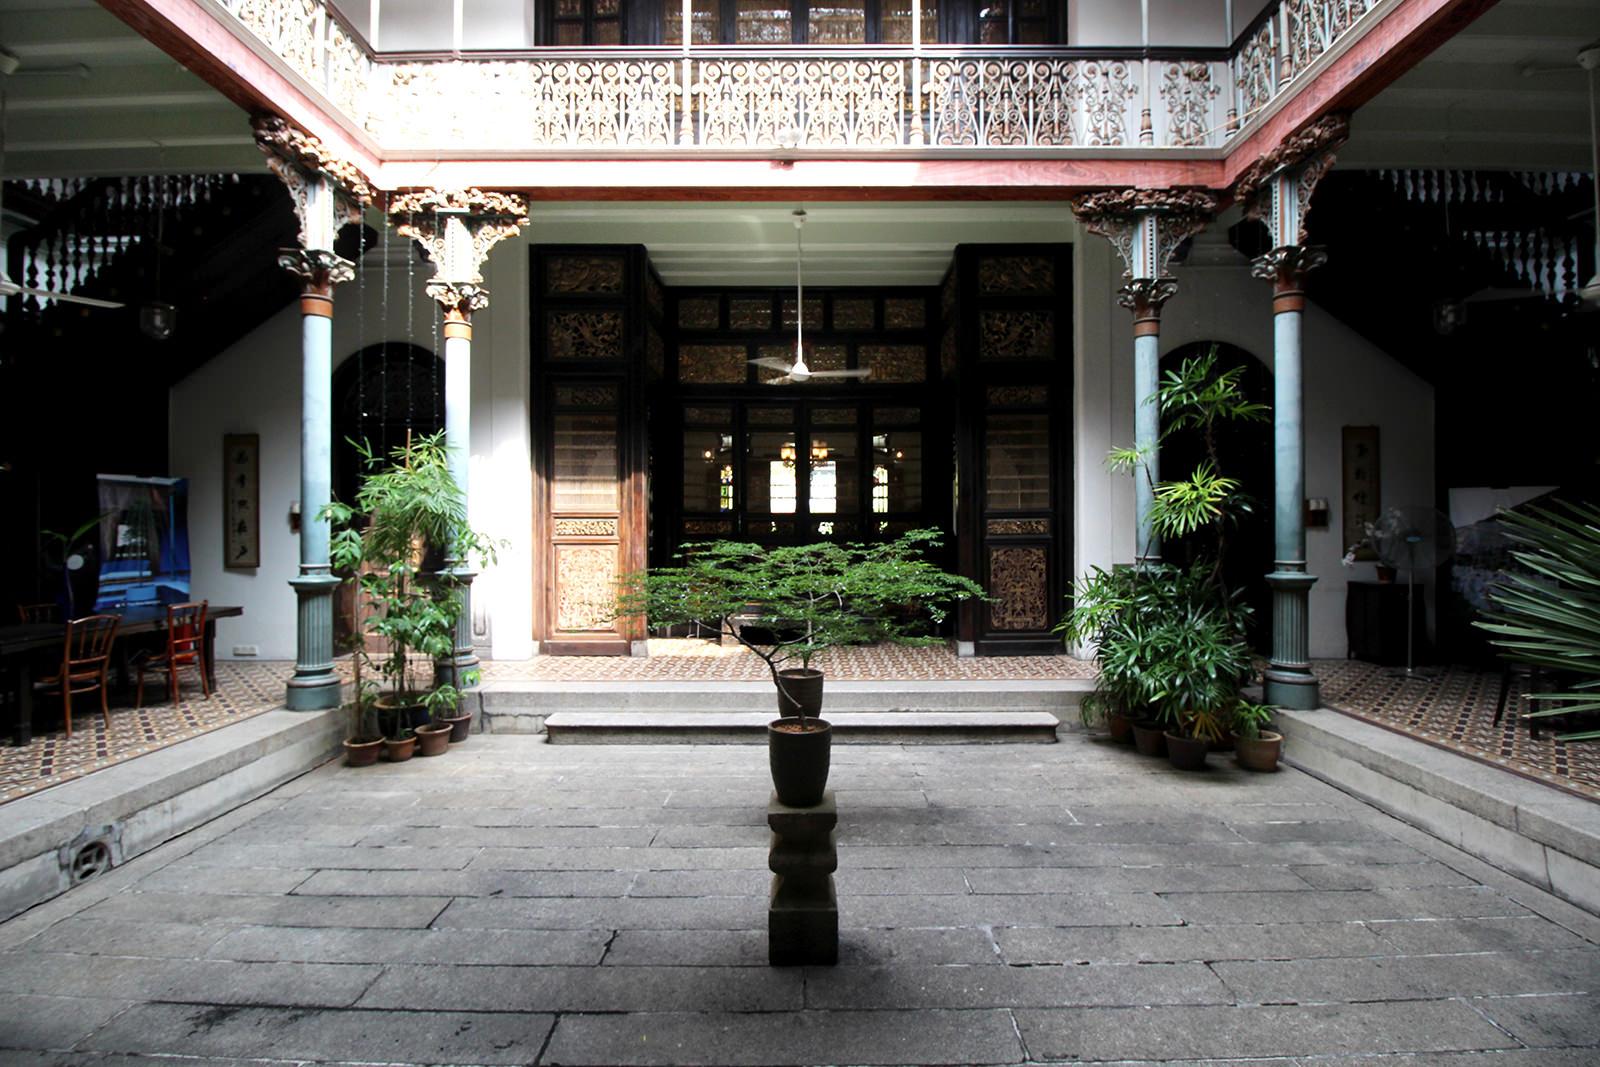 boutique-hotel-penang-island-blue-mansion-architecture-03-1 Architecture